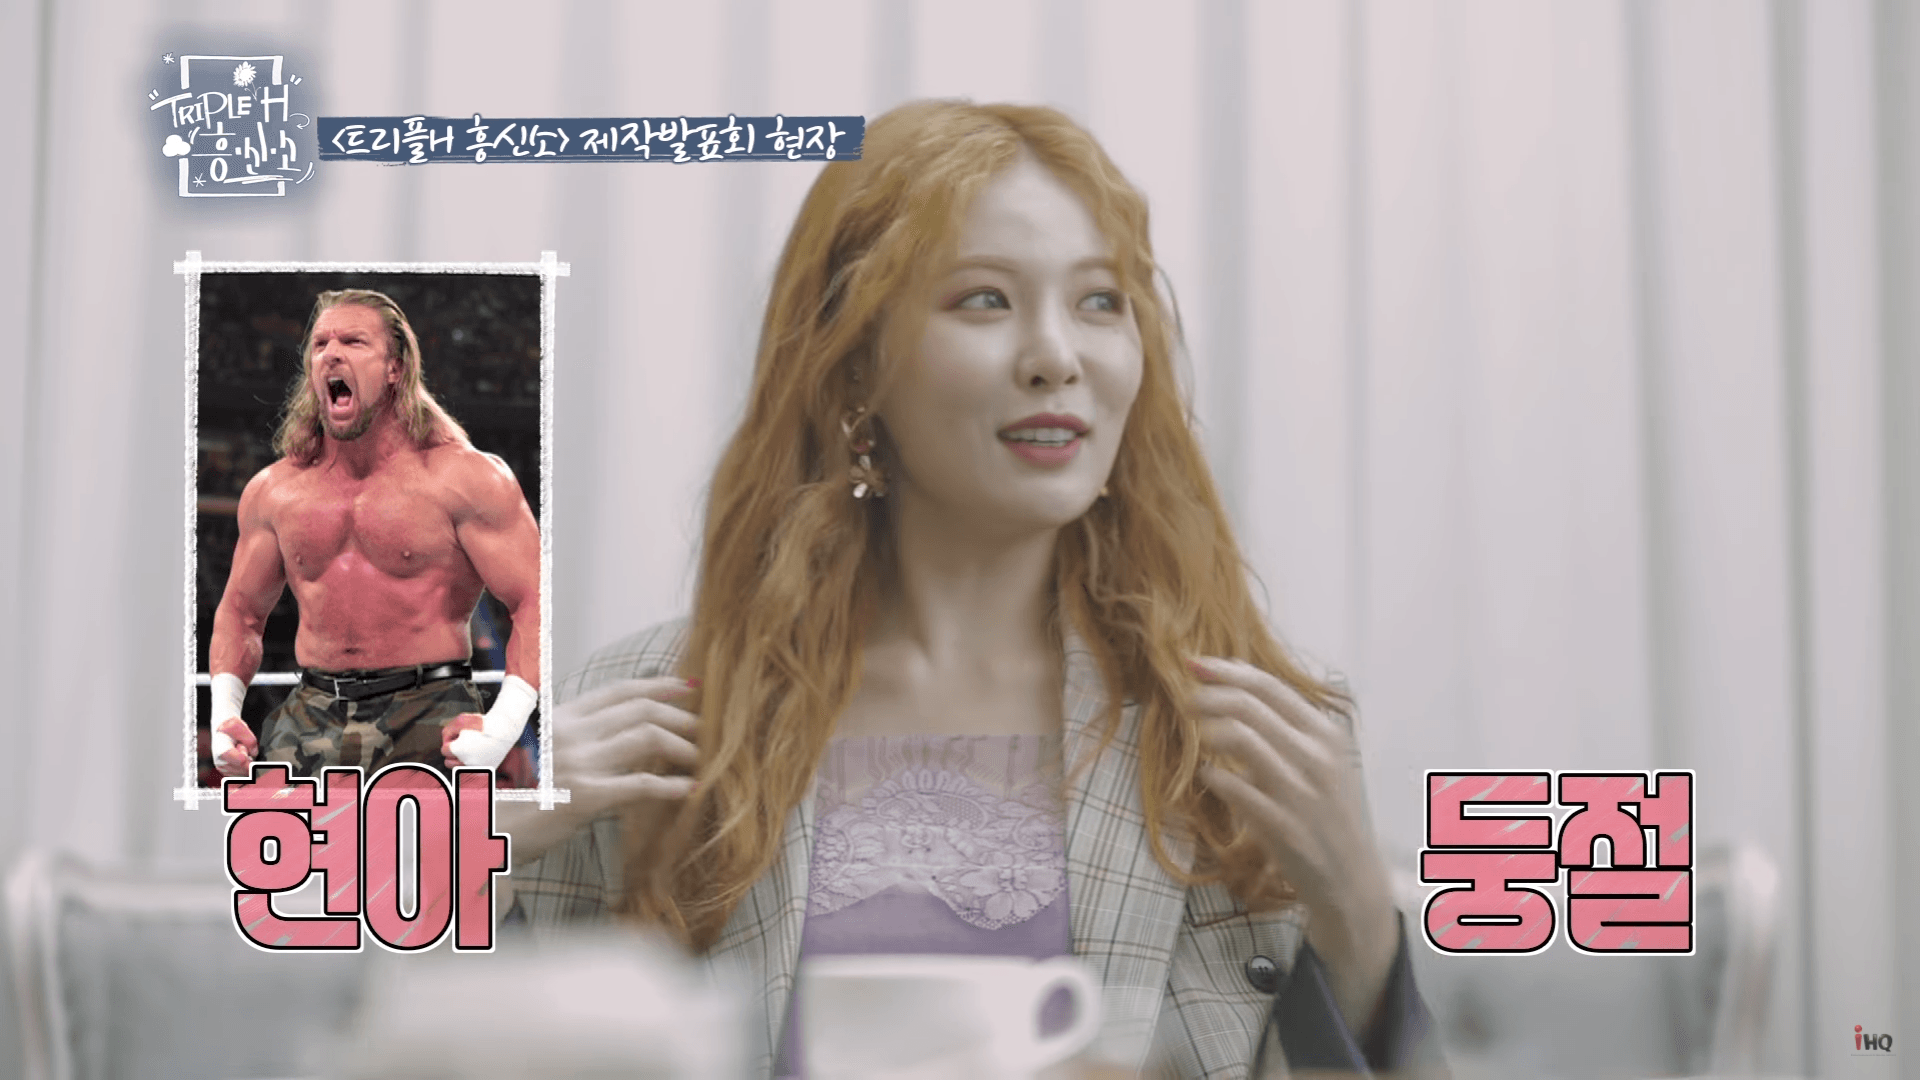 Triple H Members Think HyunA Is Like The REAL TRIPLE H